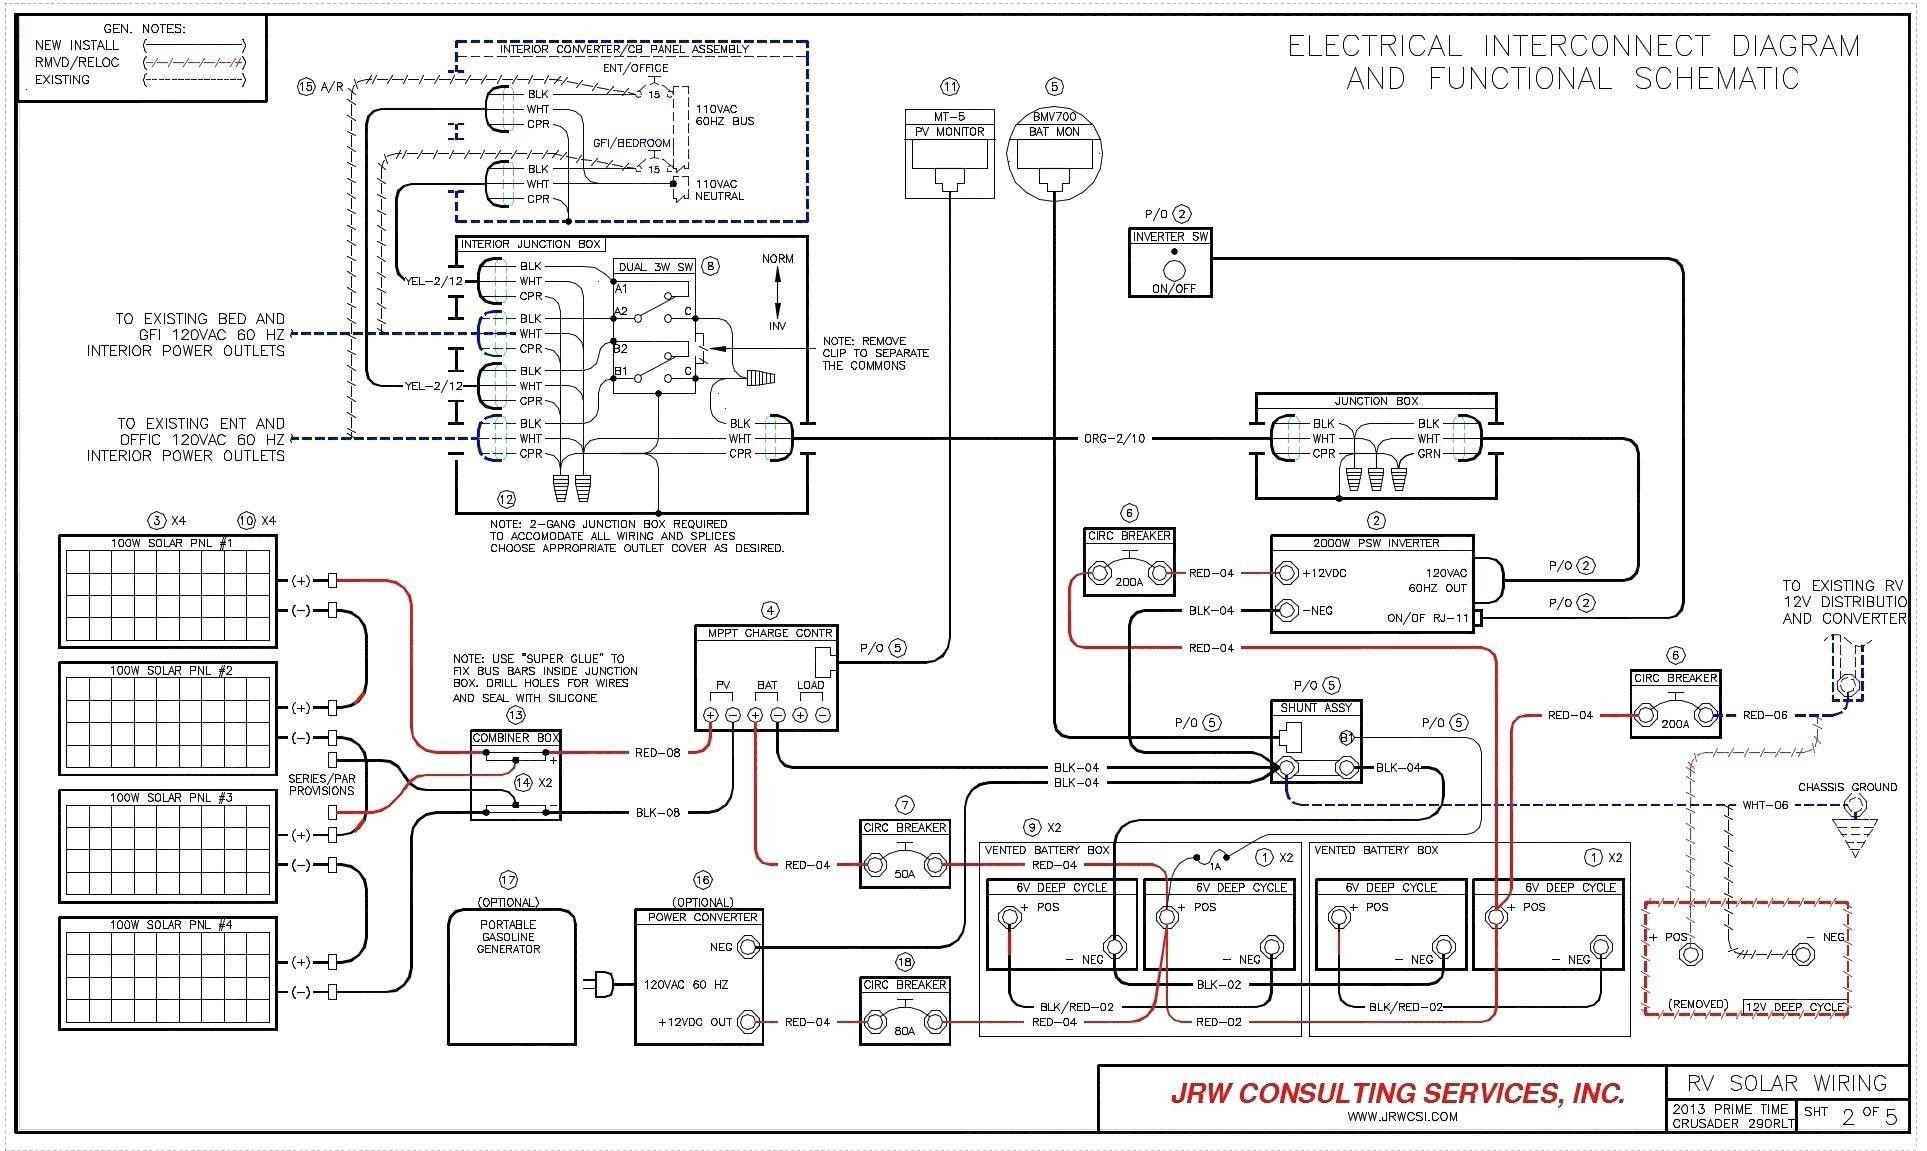 23 Best Sample Of Residential Wiring Diagram Software Design Https Bacamajalah Com 23 Best Sample Of Reside Electrical Wiring Diagram Rv Solar Solar Panels